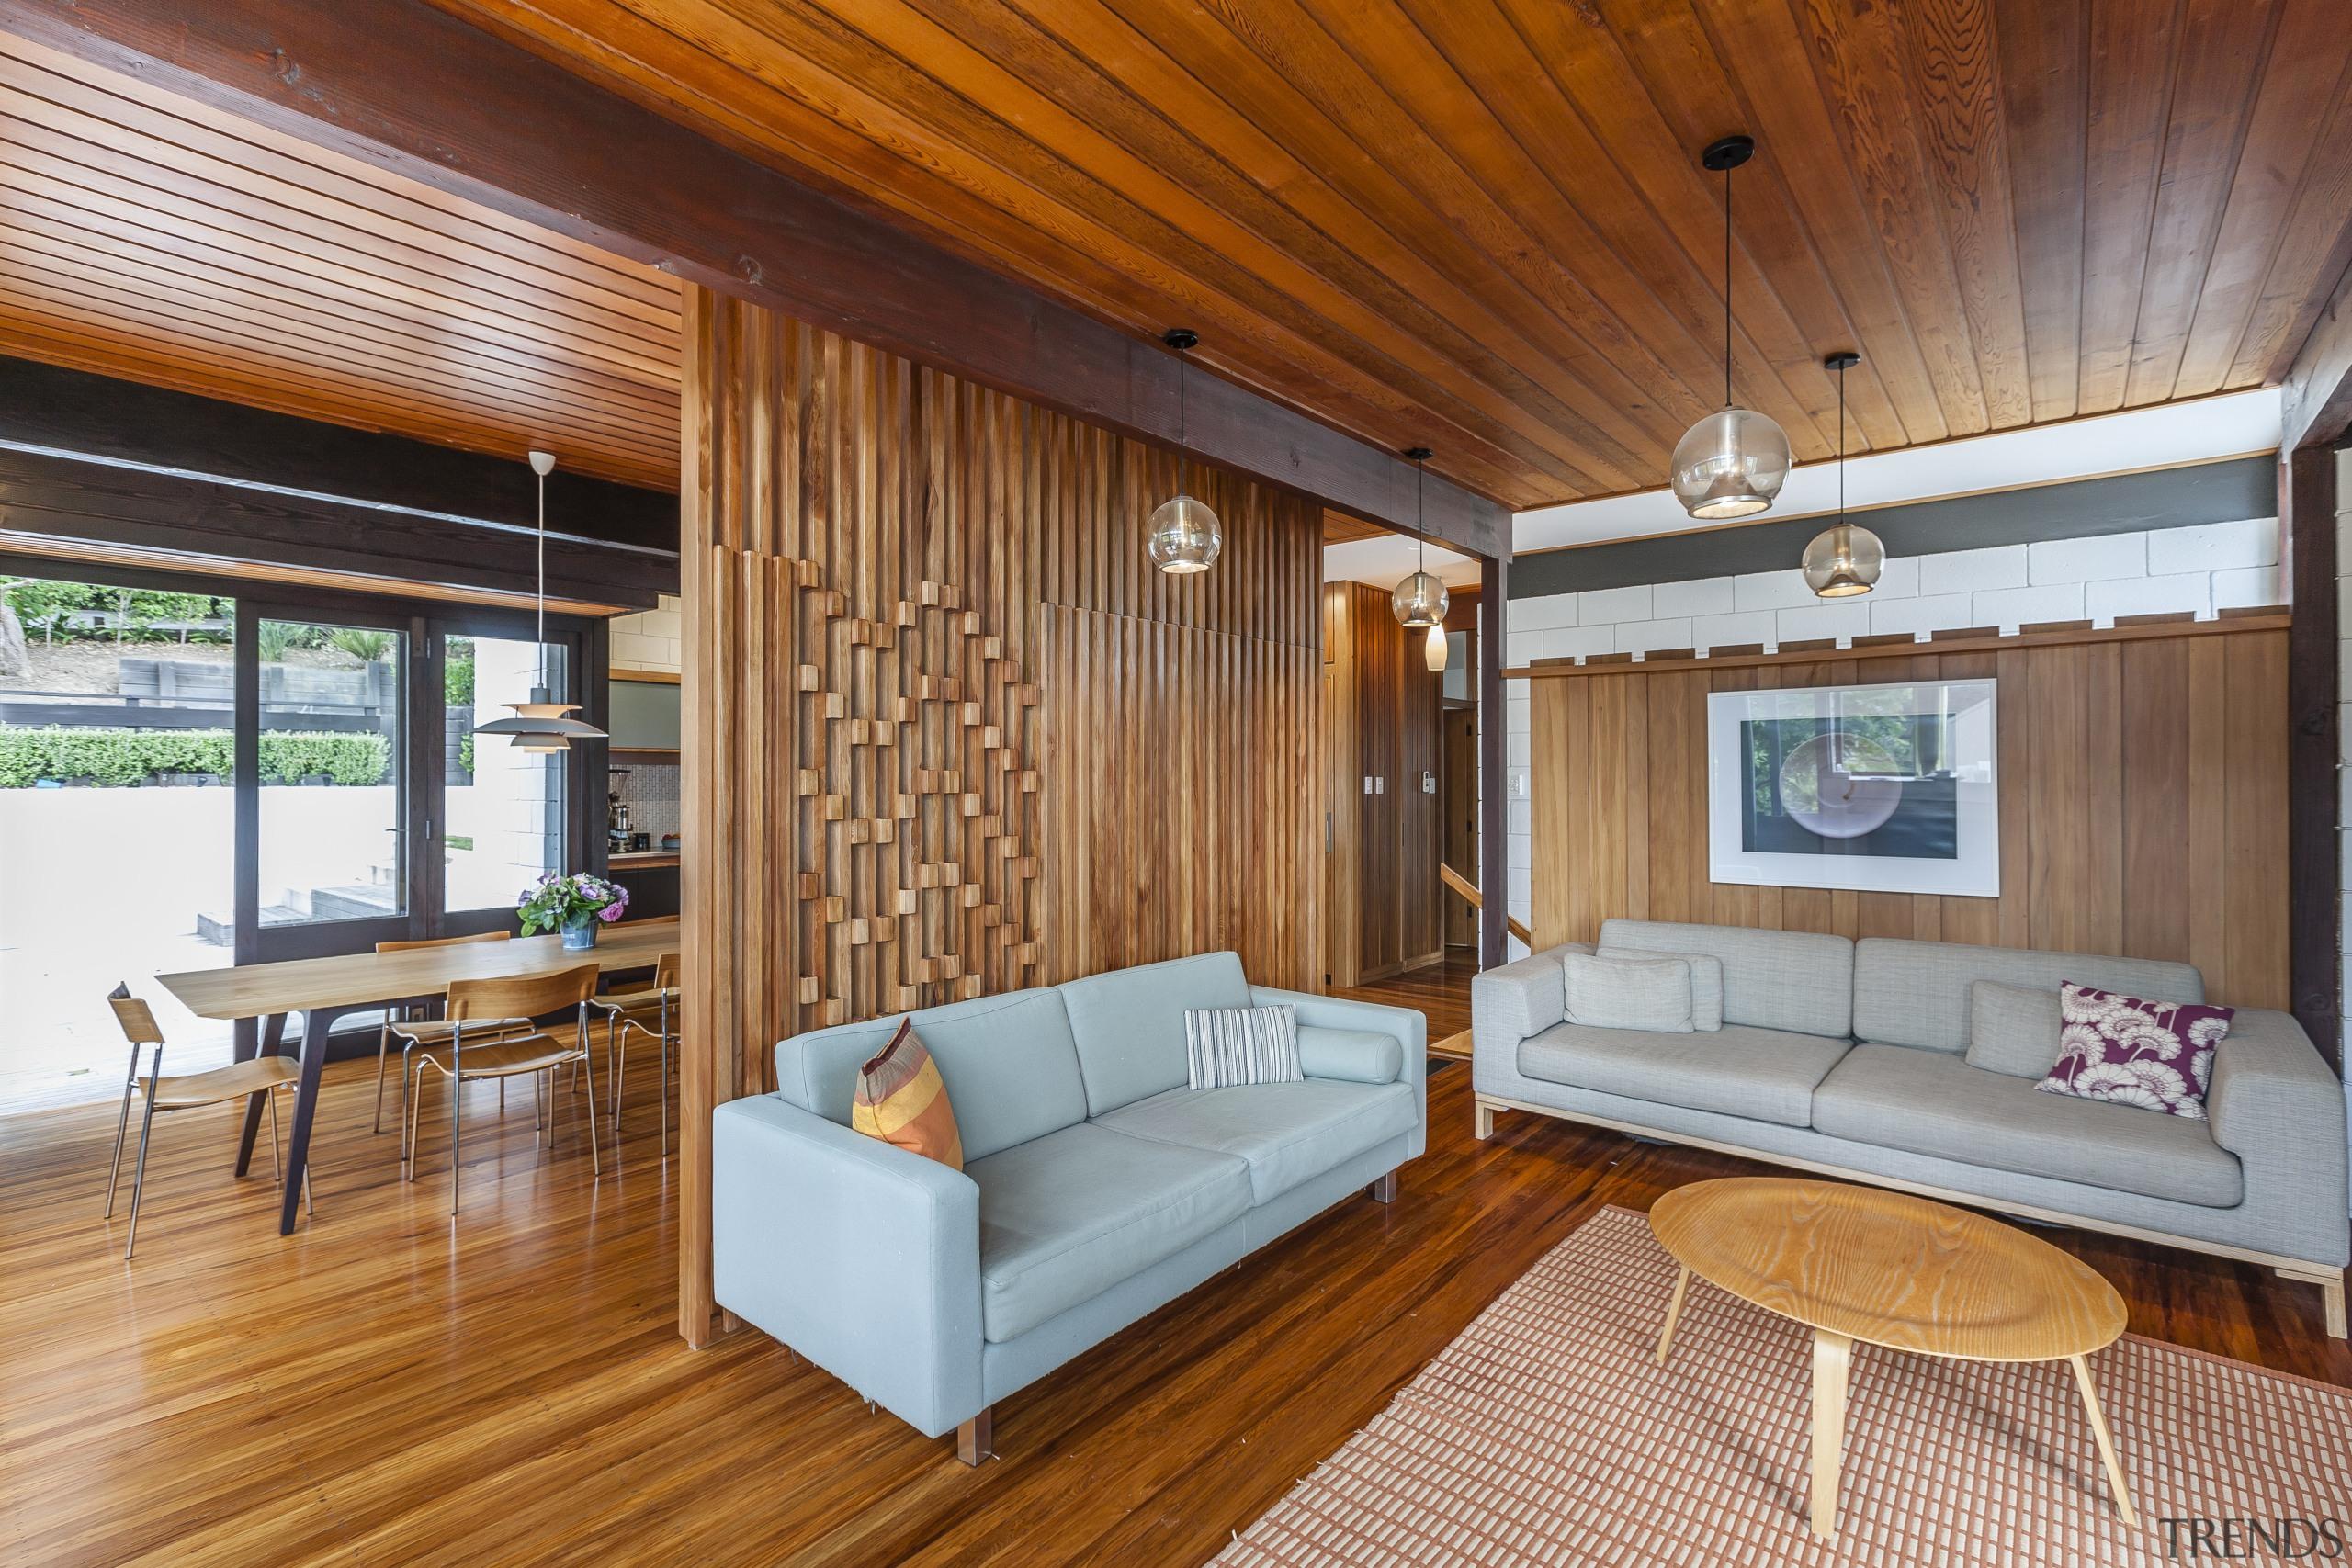 A veneer heart rimu dividing screen is a architecture, ceiling, estate, floor, hardwood, house, interior design, living room, real estate, room, suite, wood, wood flooring, brown